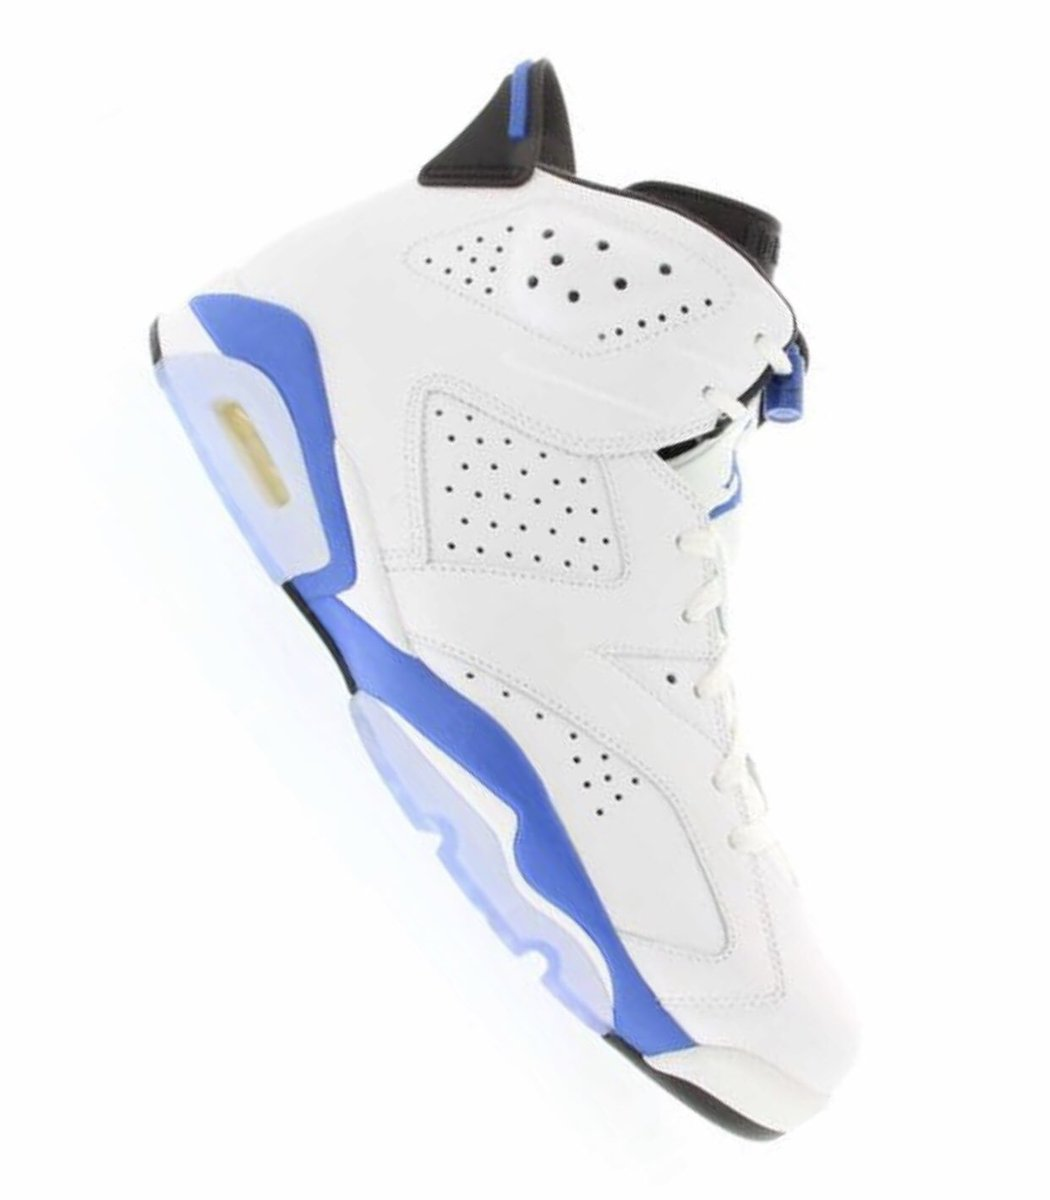 "cd7b43aa3c01  Jordan 6 Retro ""Sport Blue"" 2014 Size  9.0  sanantonio  buylocal   shoplocal  shopsmallbusiness  countdownclothing  southside  sananto  shoes   jordan6 ..."